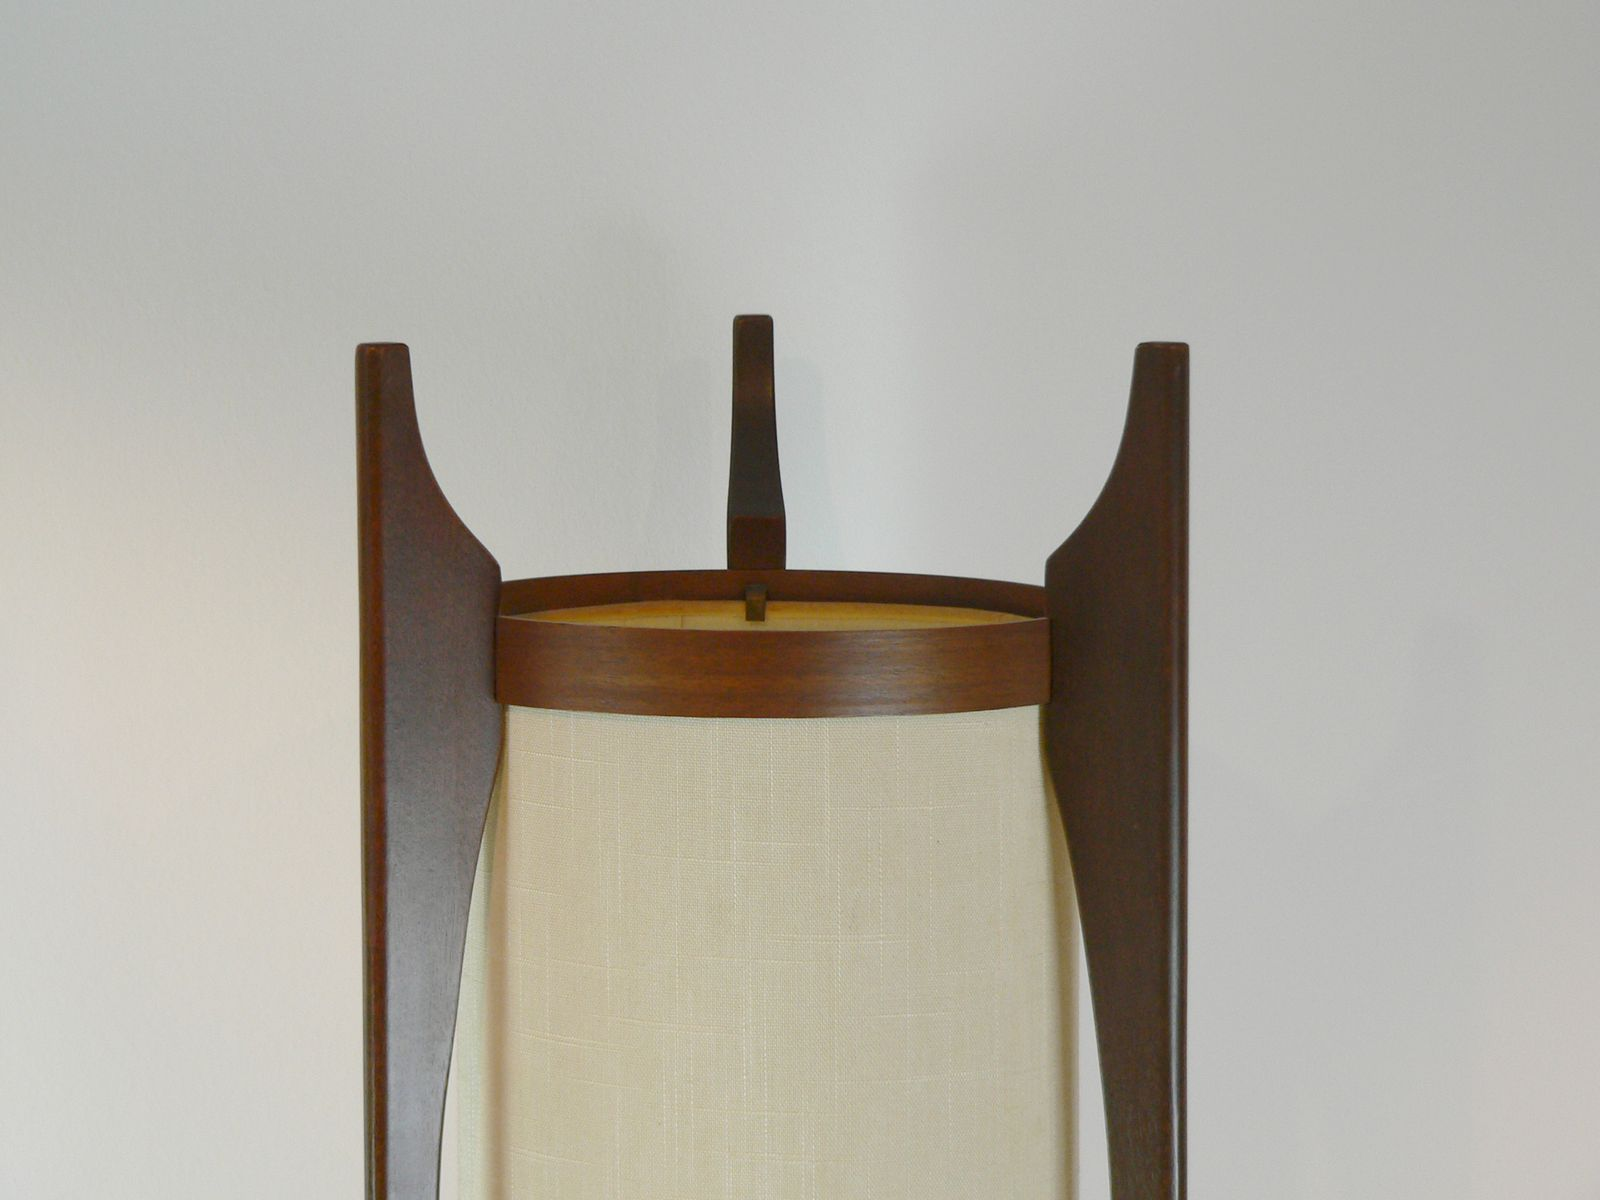 lampadaire en noyer am rician 1950s en vente sur pamono. Black Bedroom Furniture Sets. Home Design Ideas